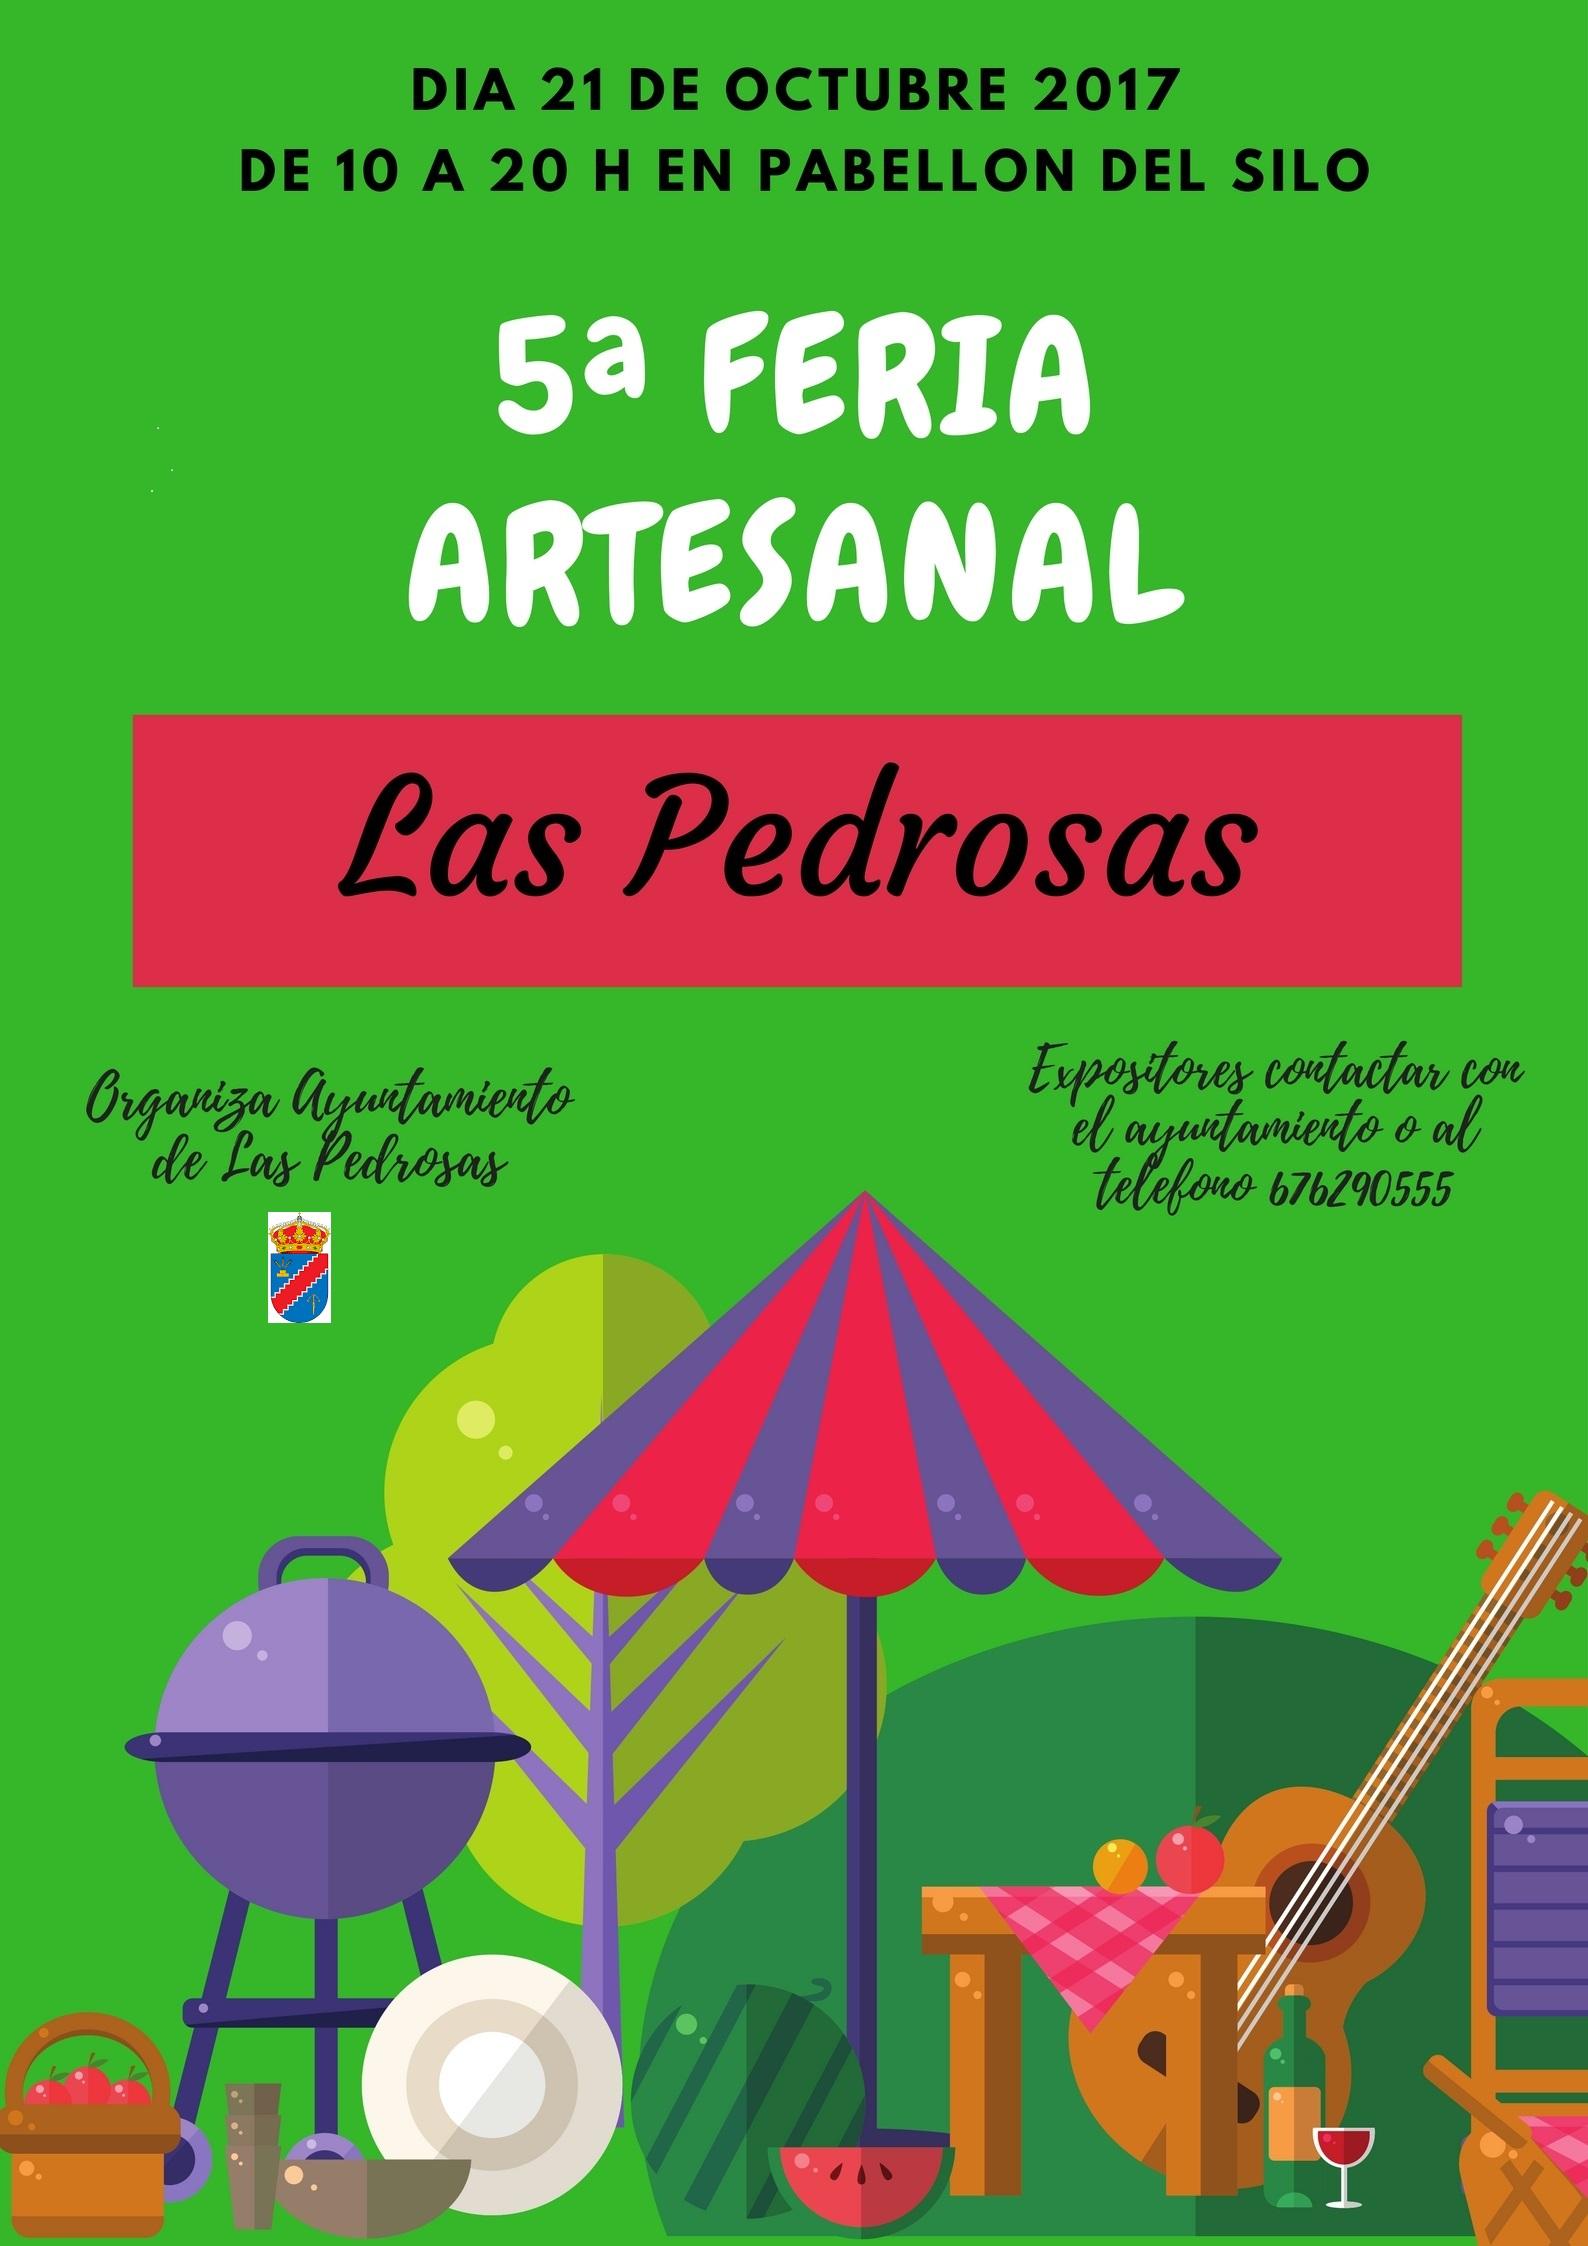 V Feria del Producto Aragonés en Las Pedrosas